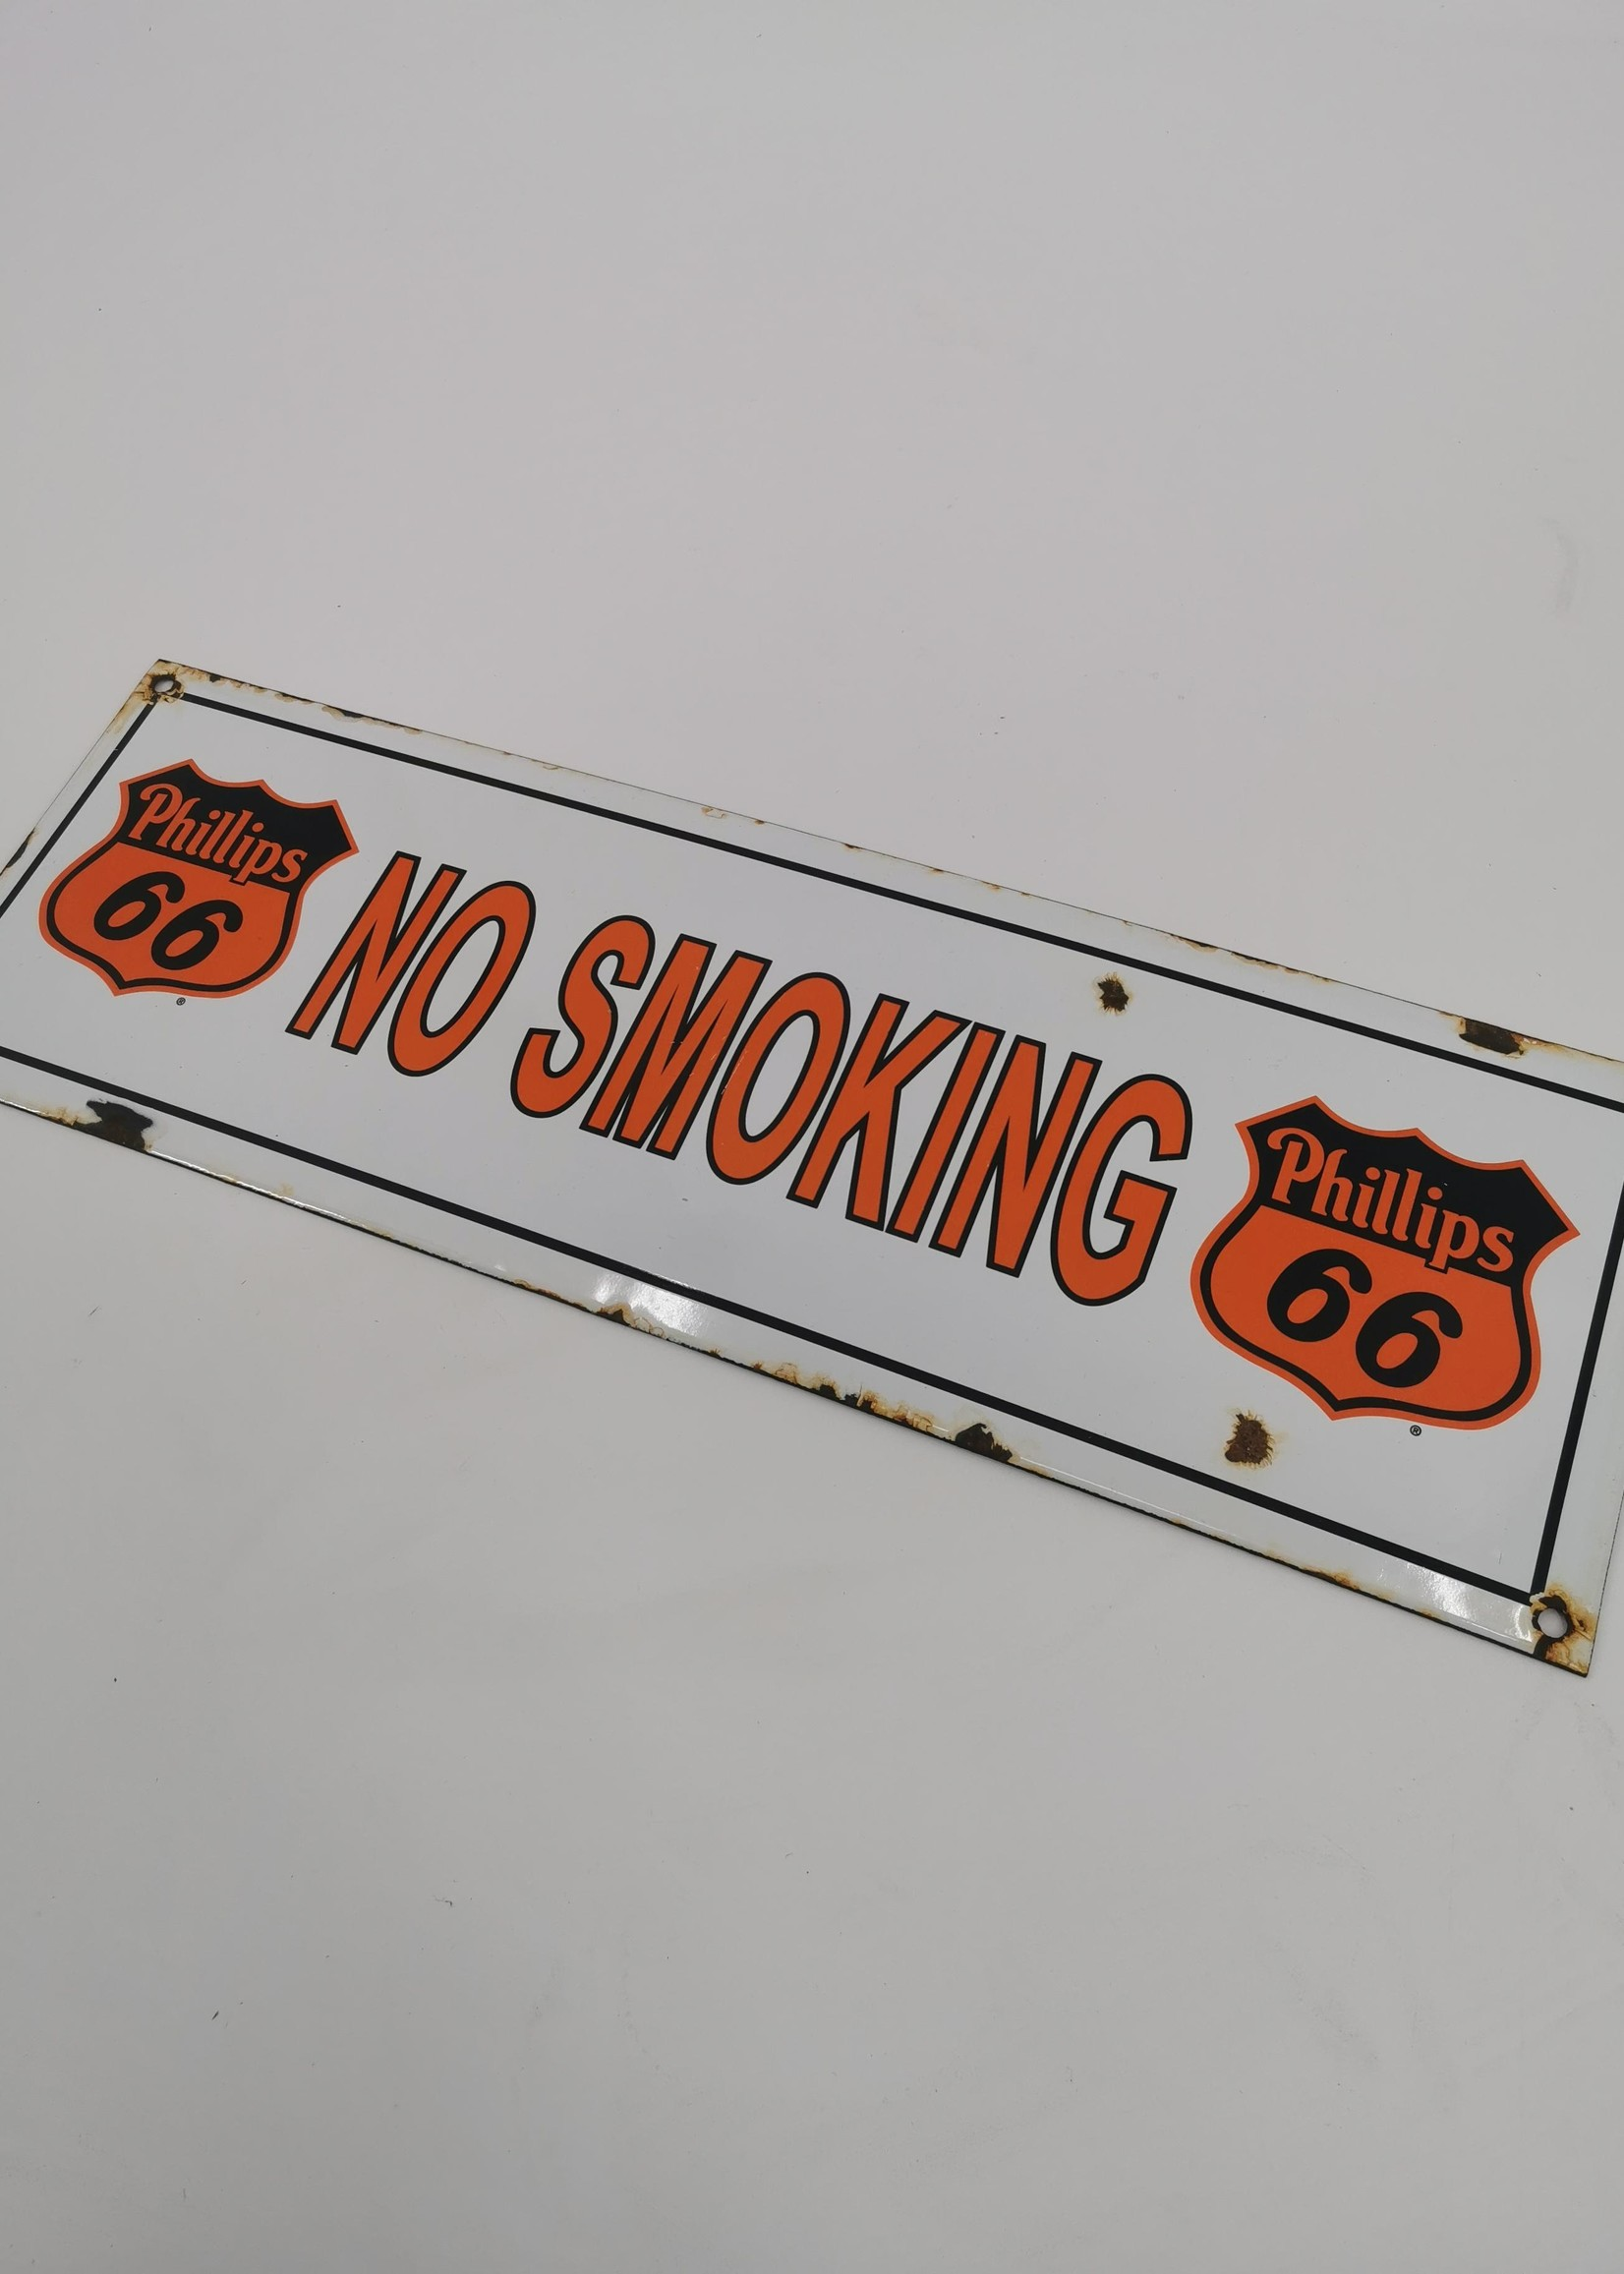 Philips 66 No smoking bord